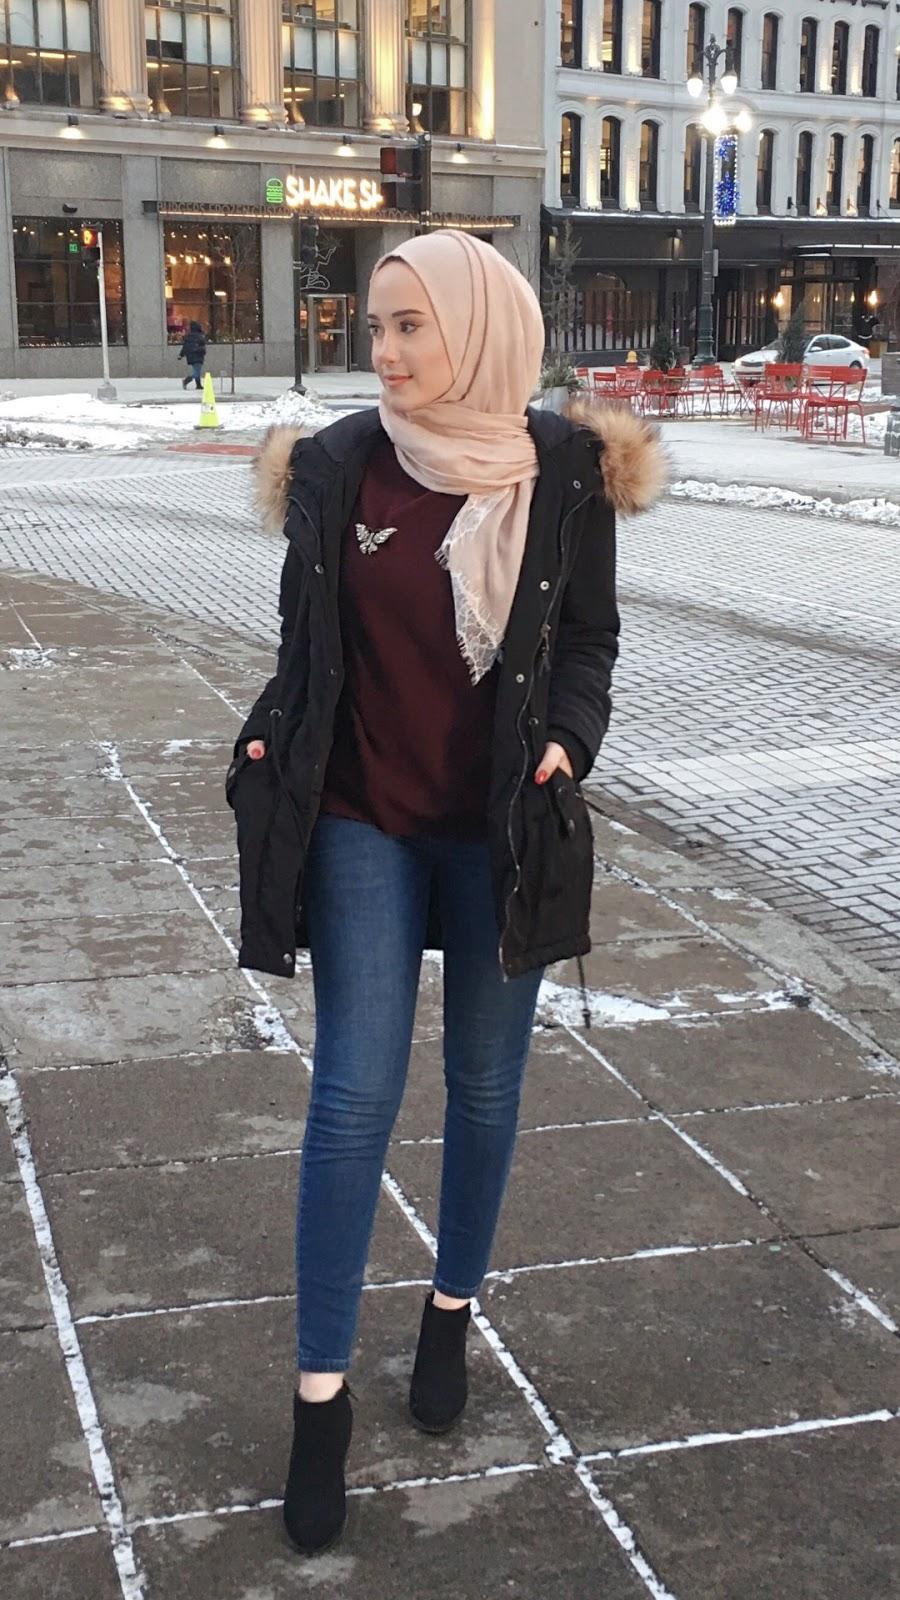 wallpaper muslimah cantik hijab seksi dan hot manis hot imut